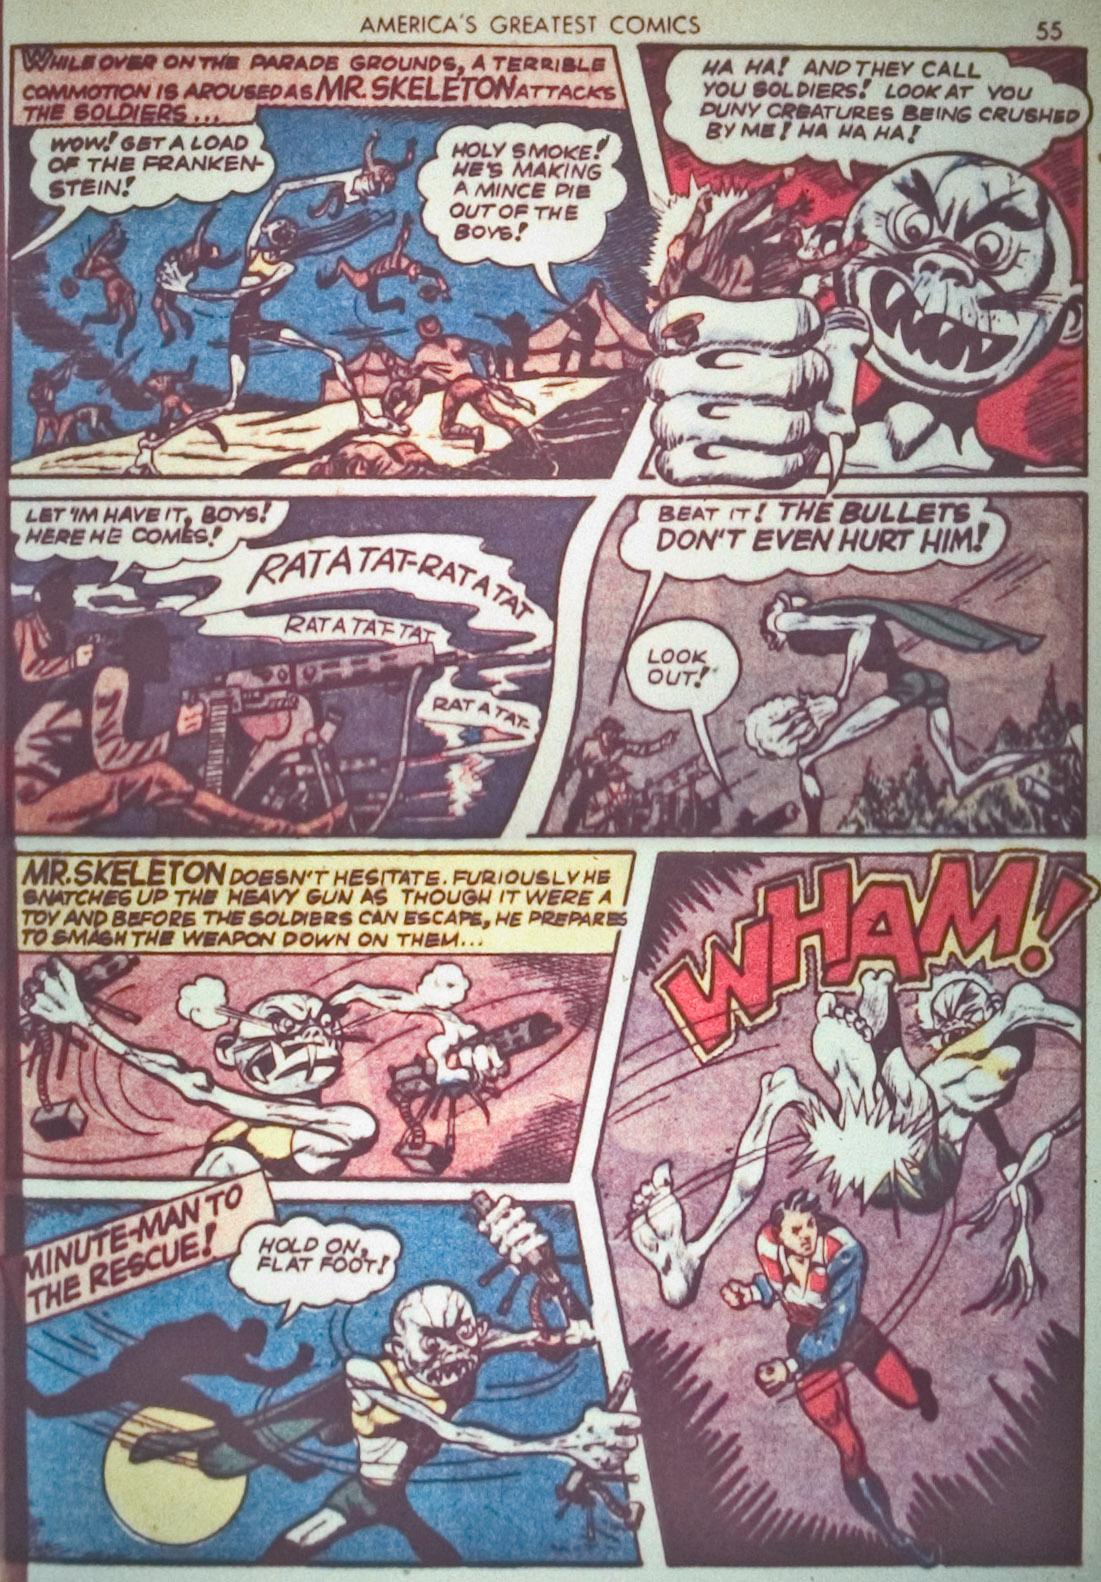 Read online America's Greatest Comics comic -  Issue #1 - 58